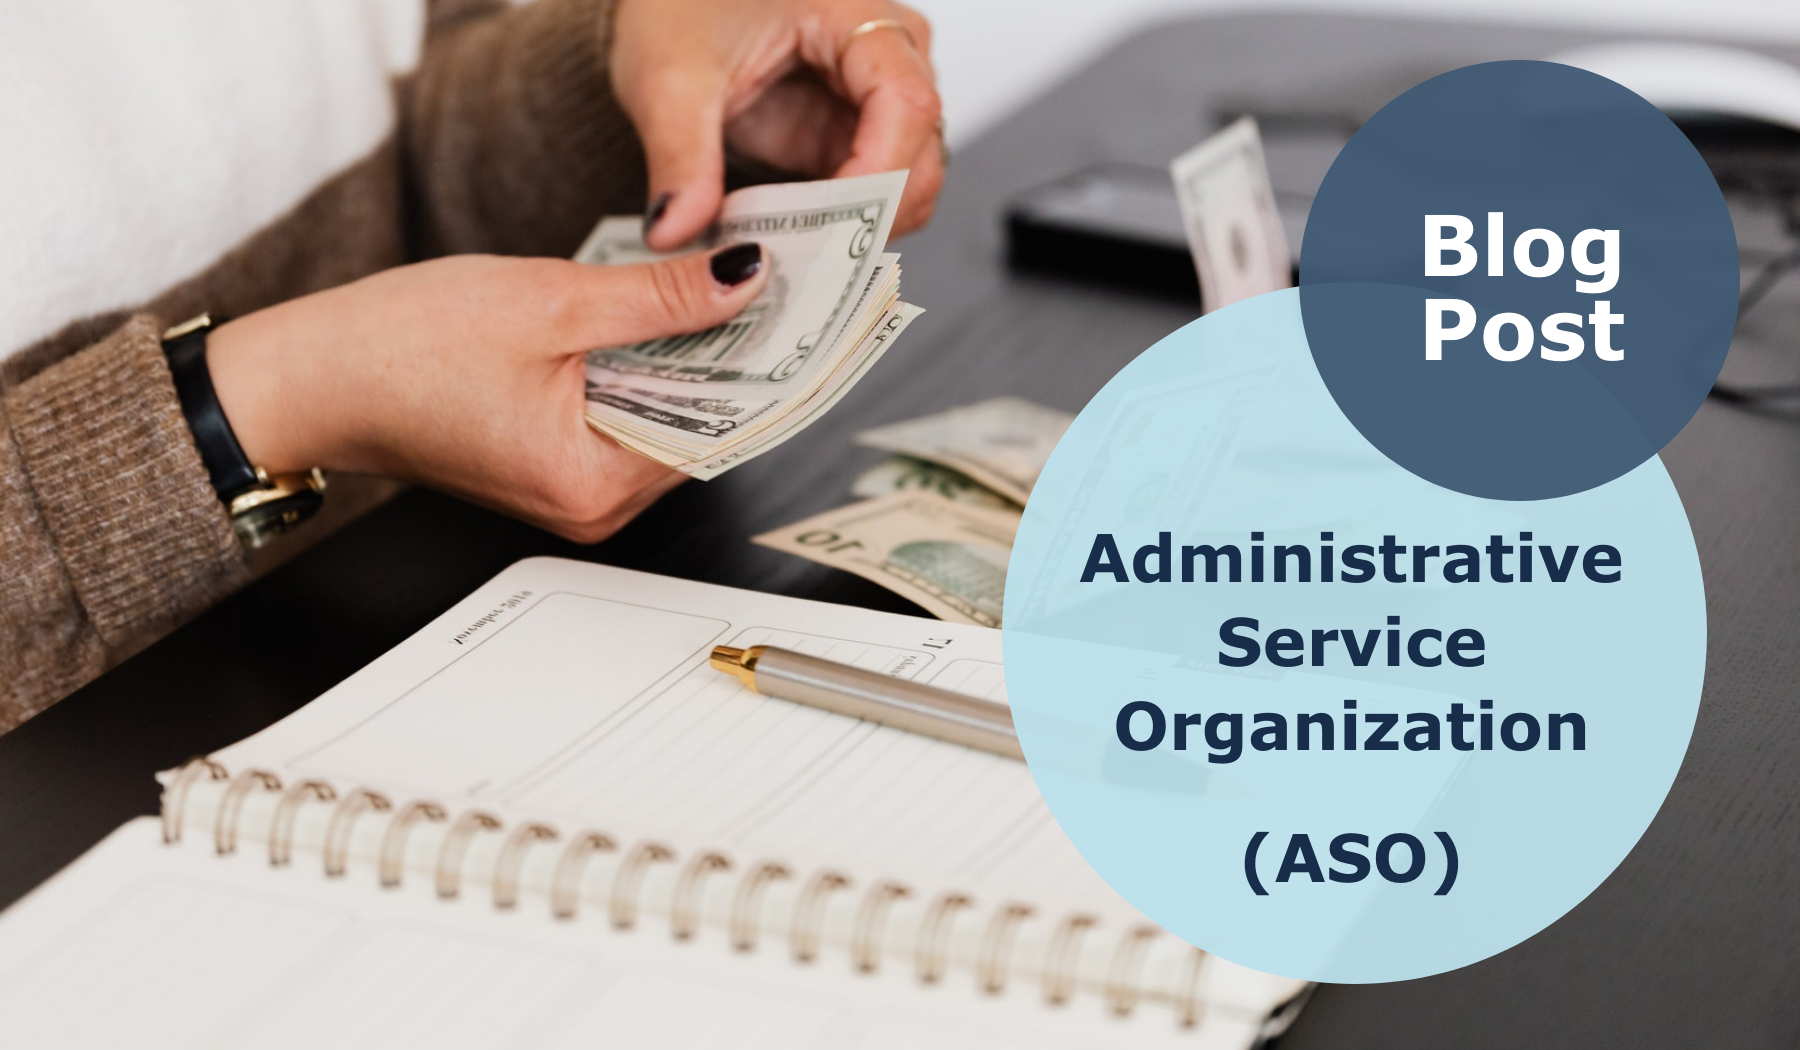 European Administrative Services Organization ASO